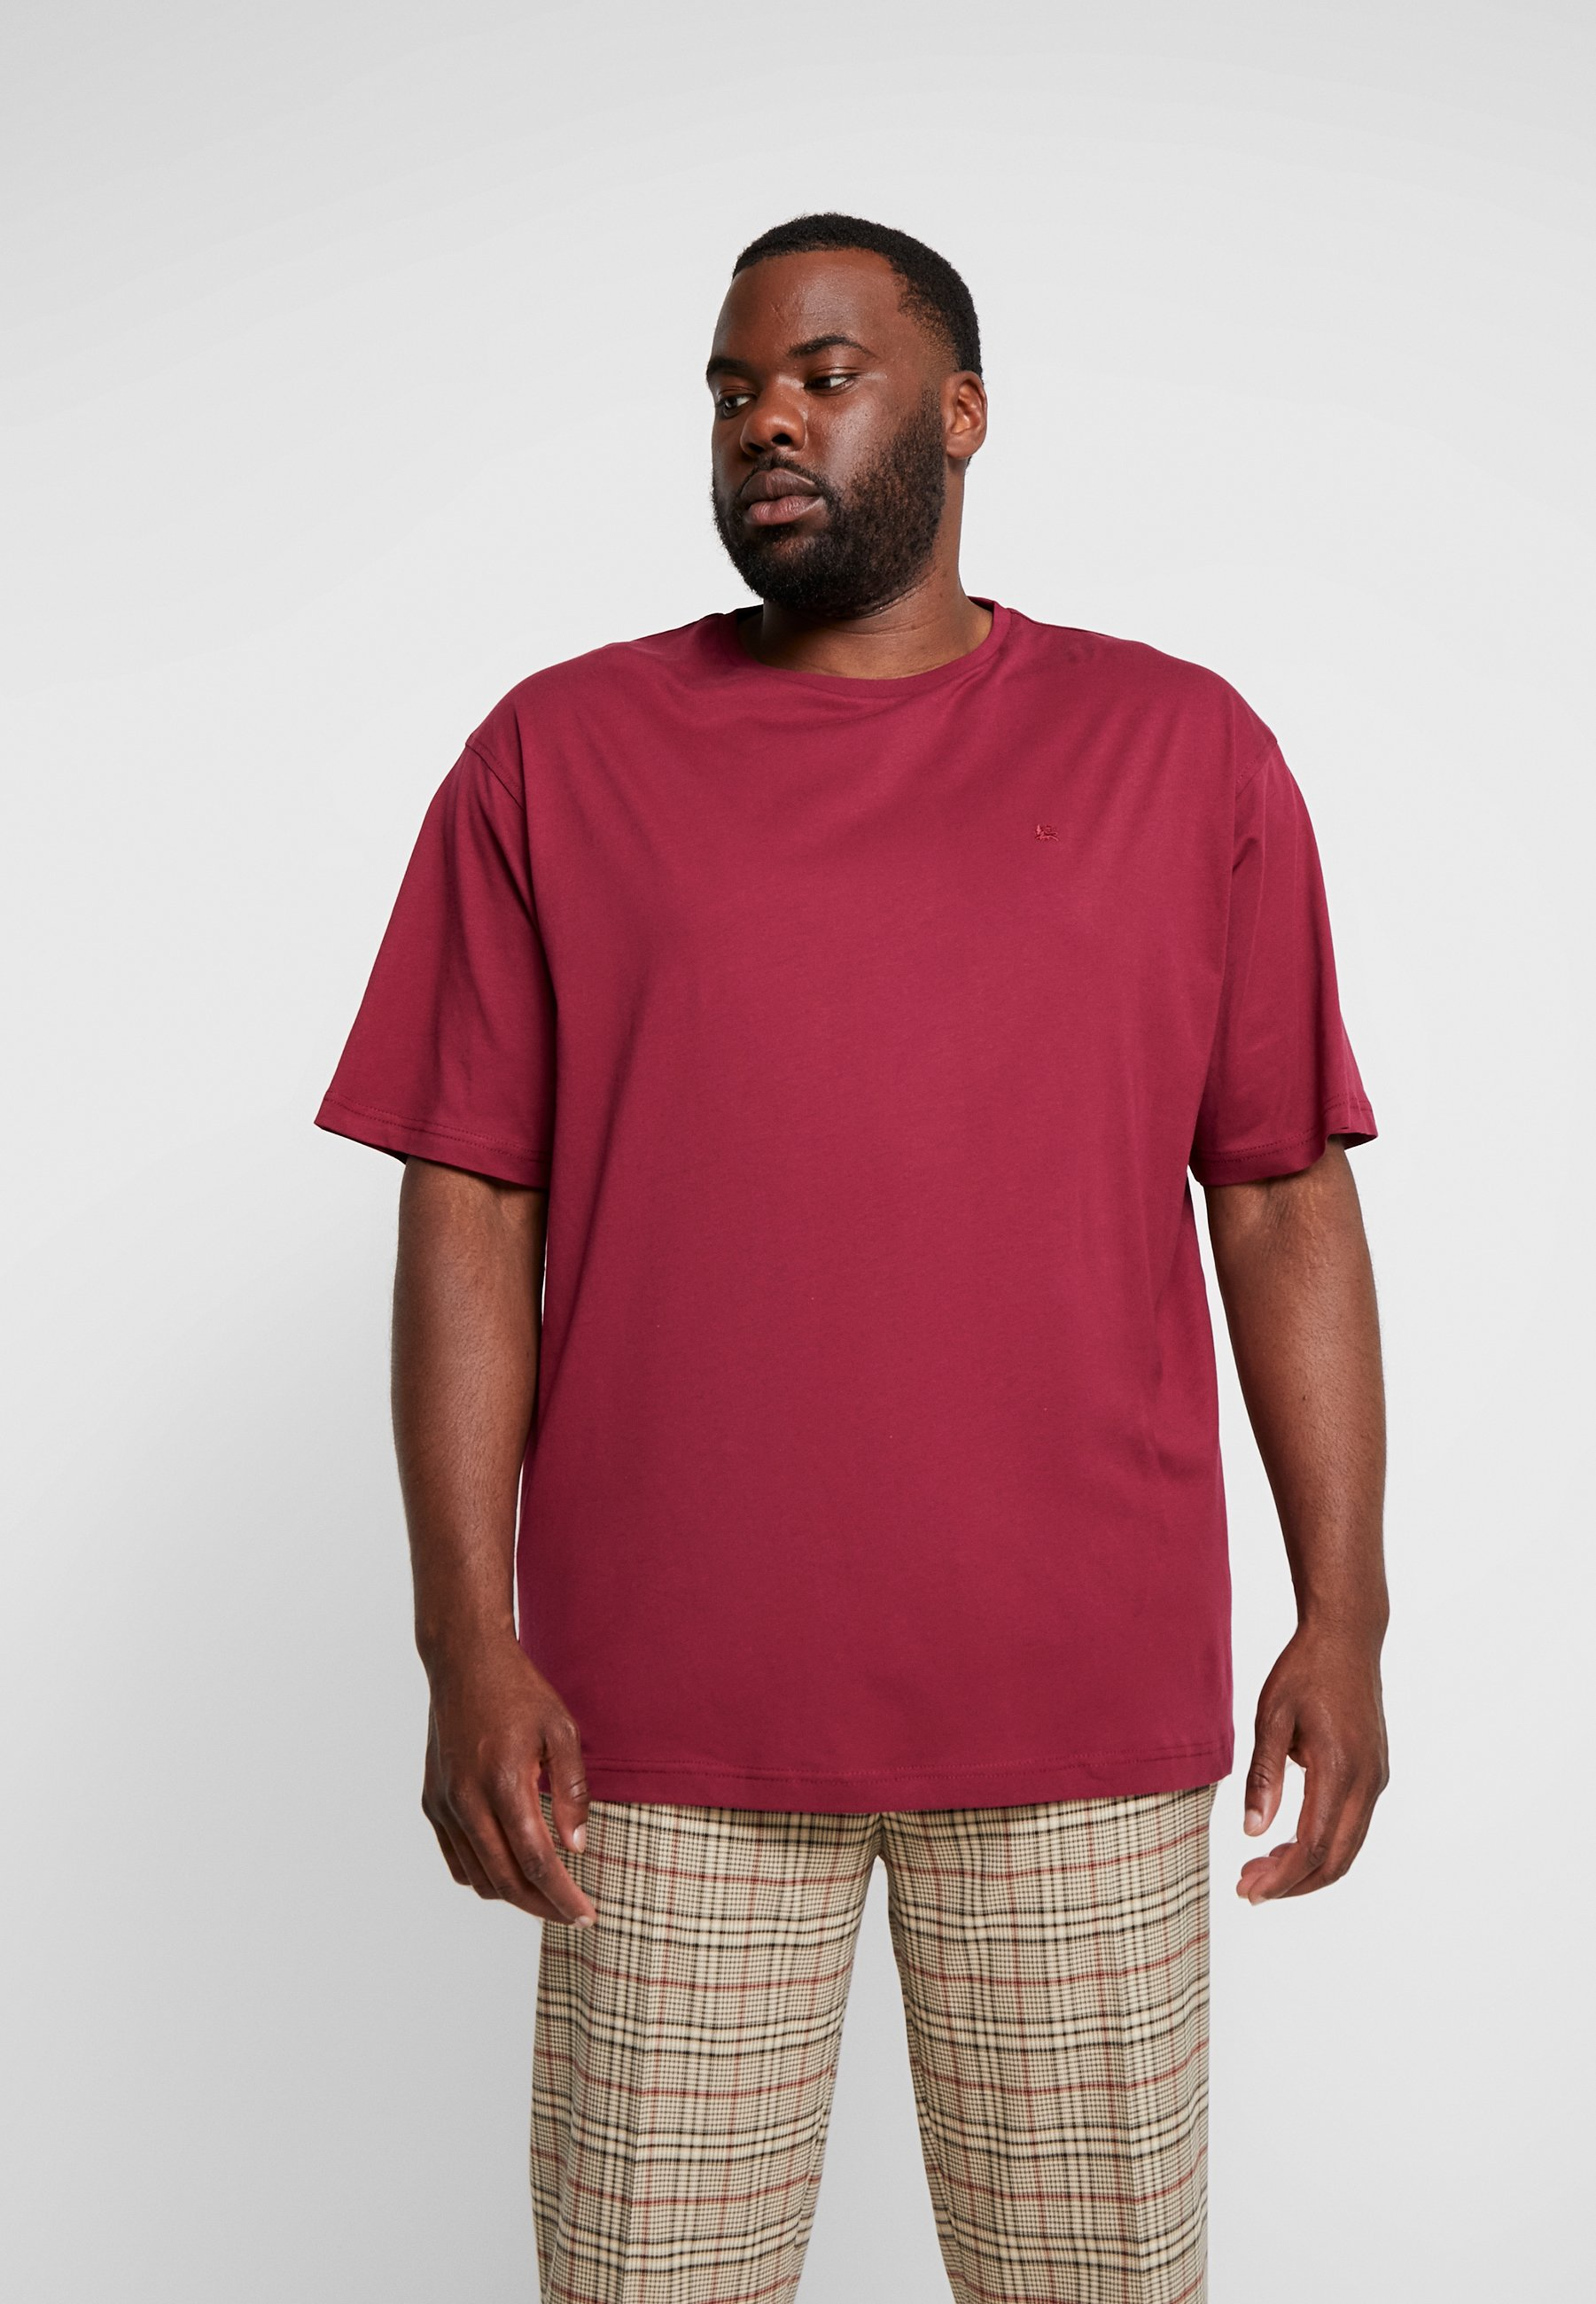 Winter Basique Lerros Berry UebergroesseT shirt 354AqRjL